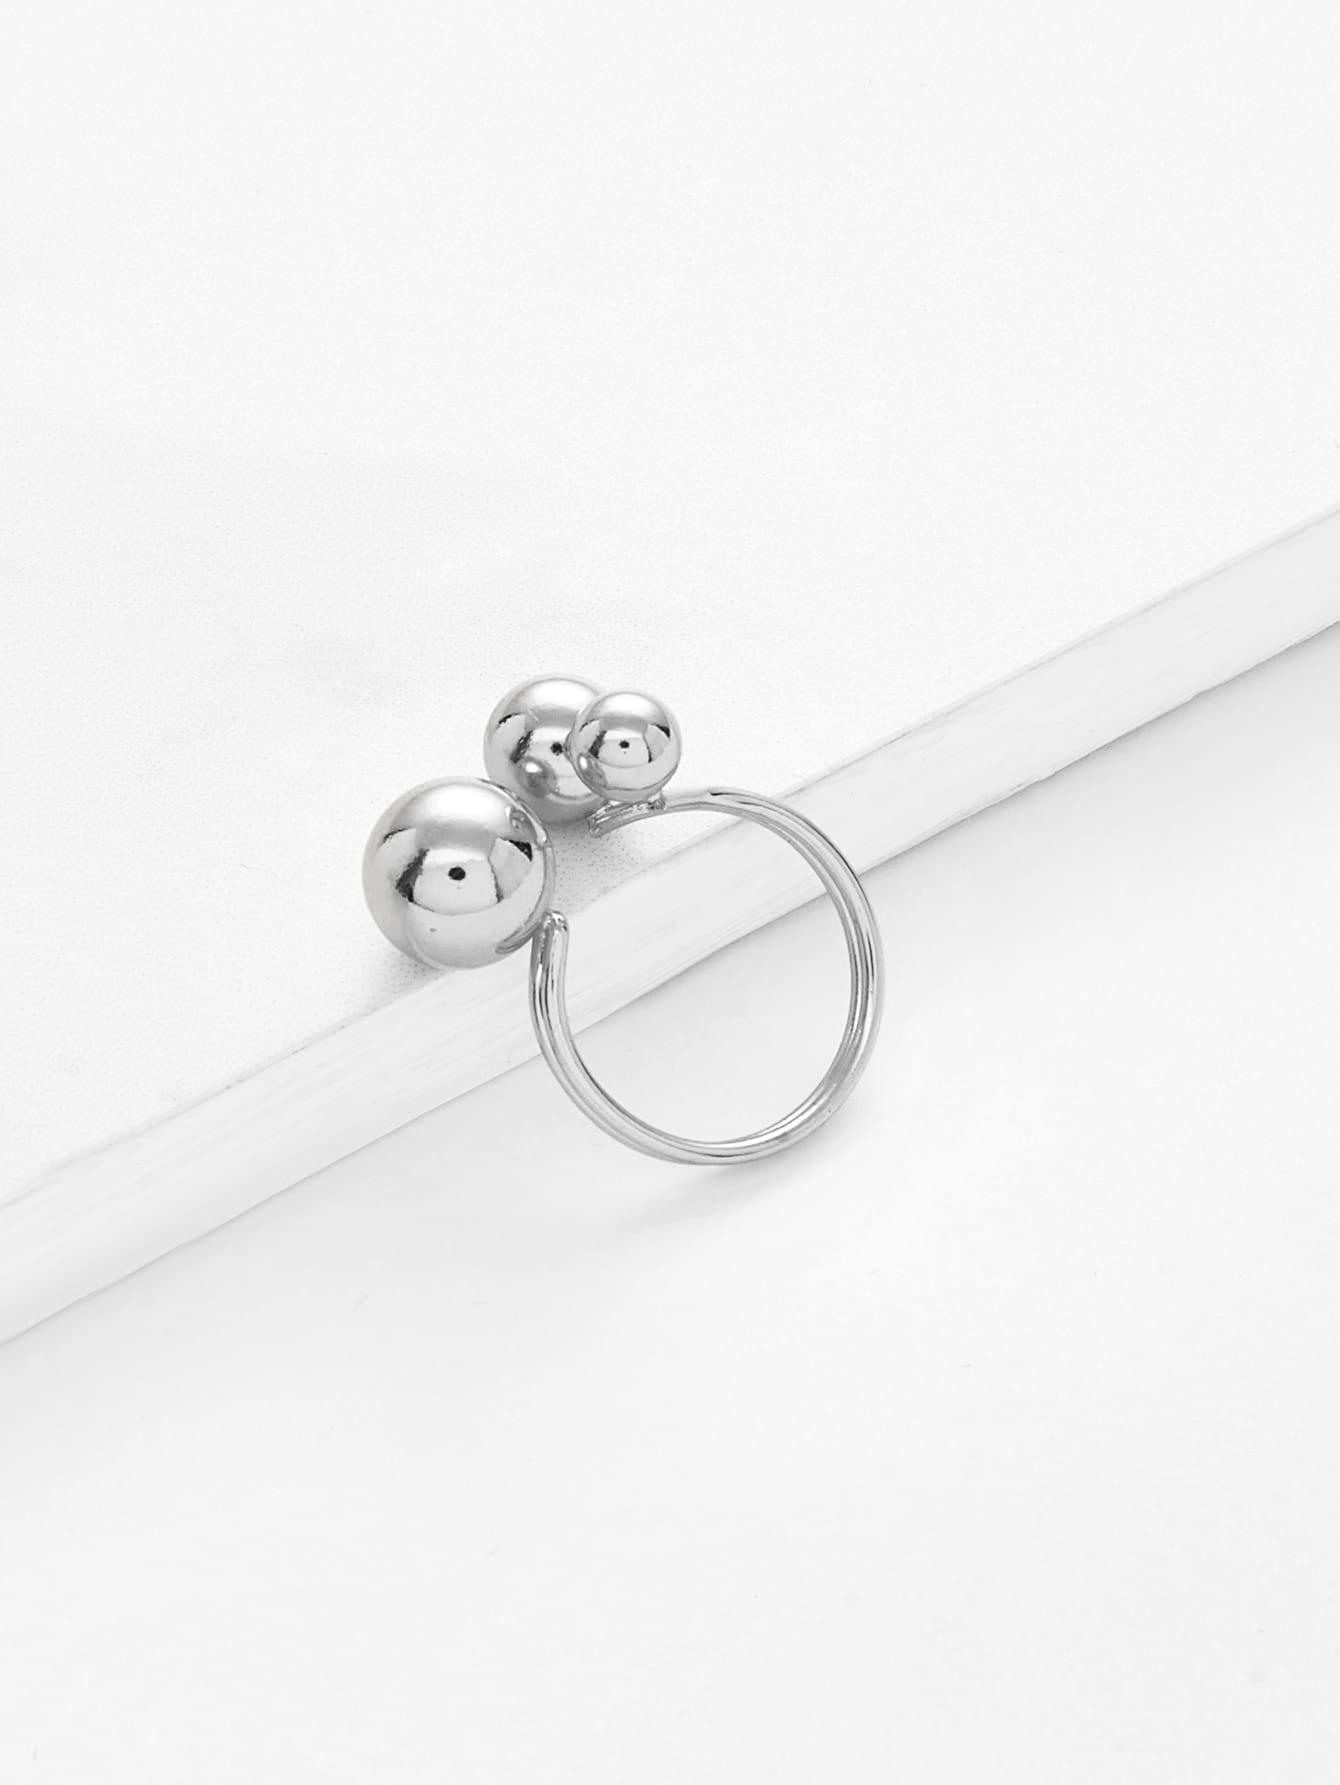 Metal Ball Design Open Ring open heart design ring